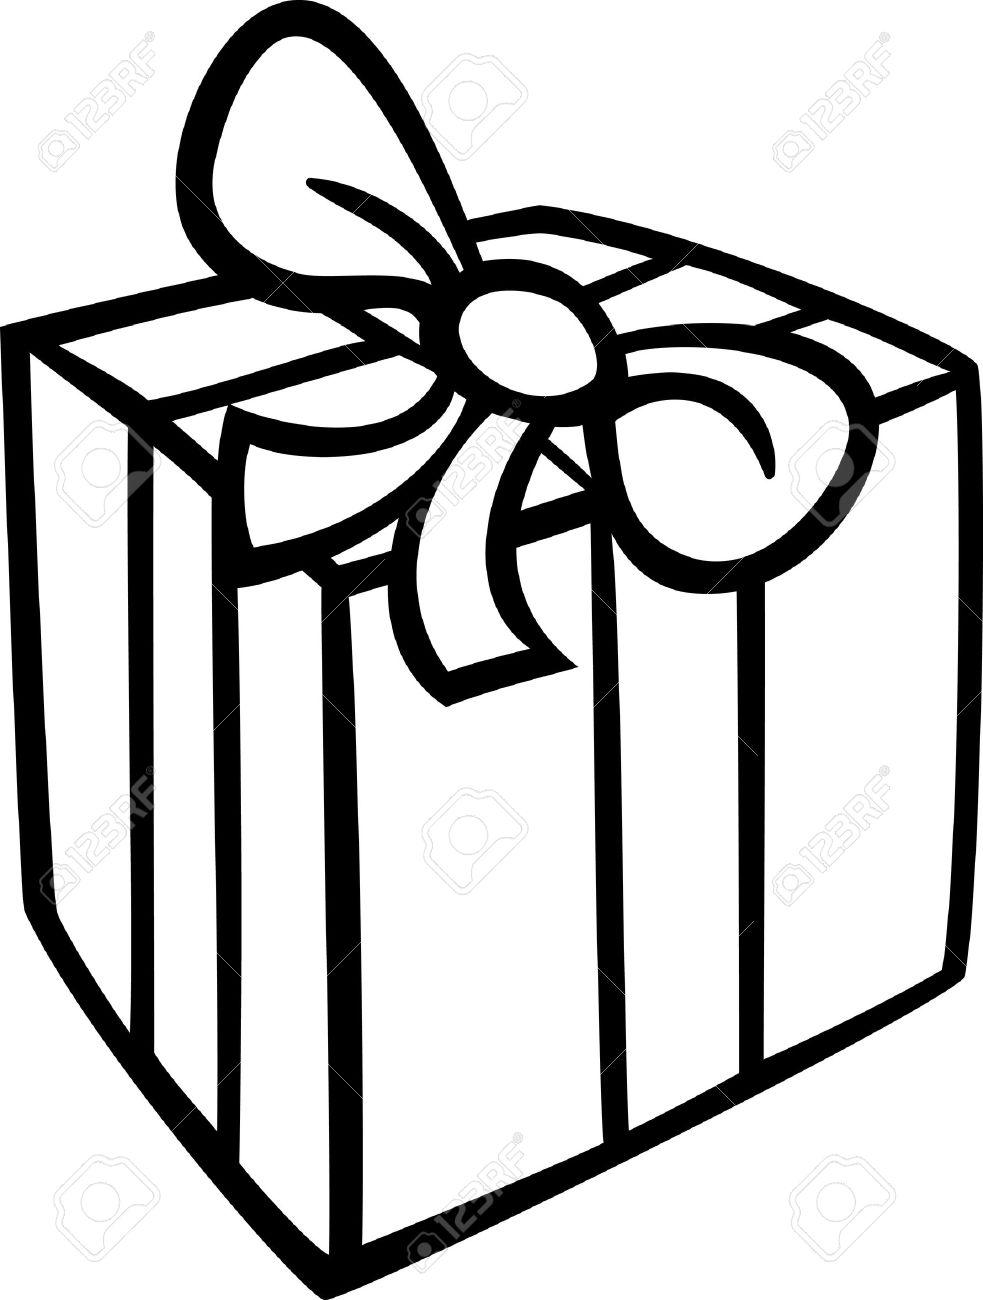 983x1300 Black And White Cartoon Illustration Of Christmas Or Birthday